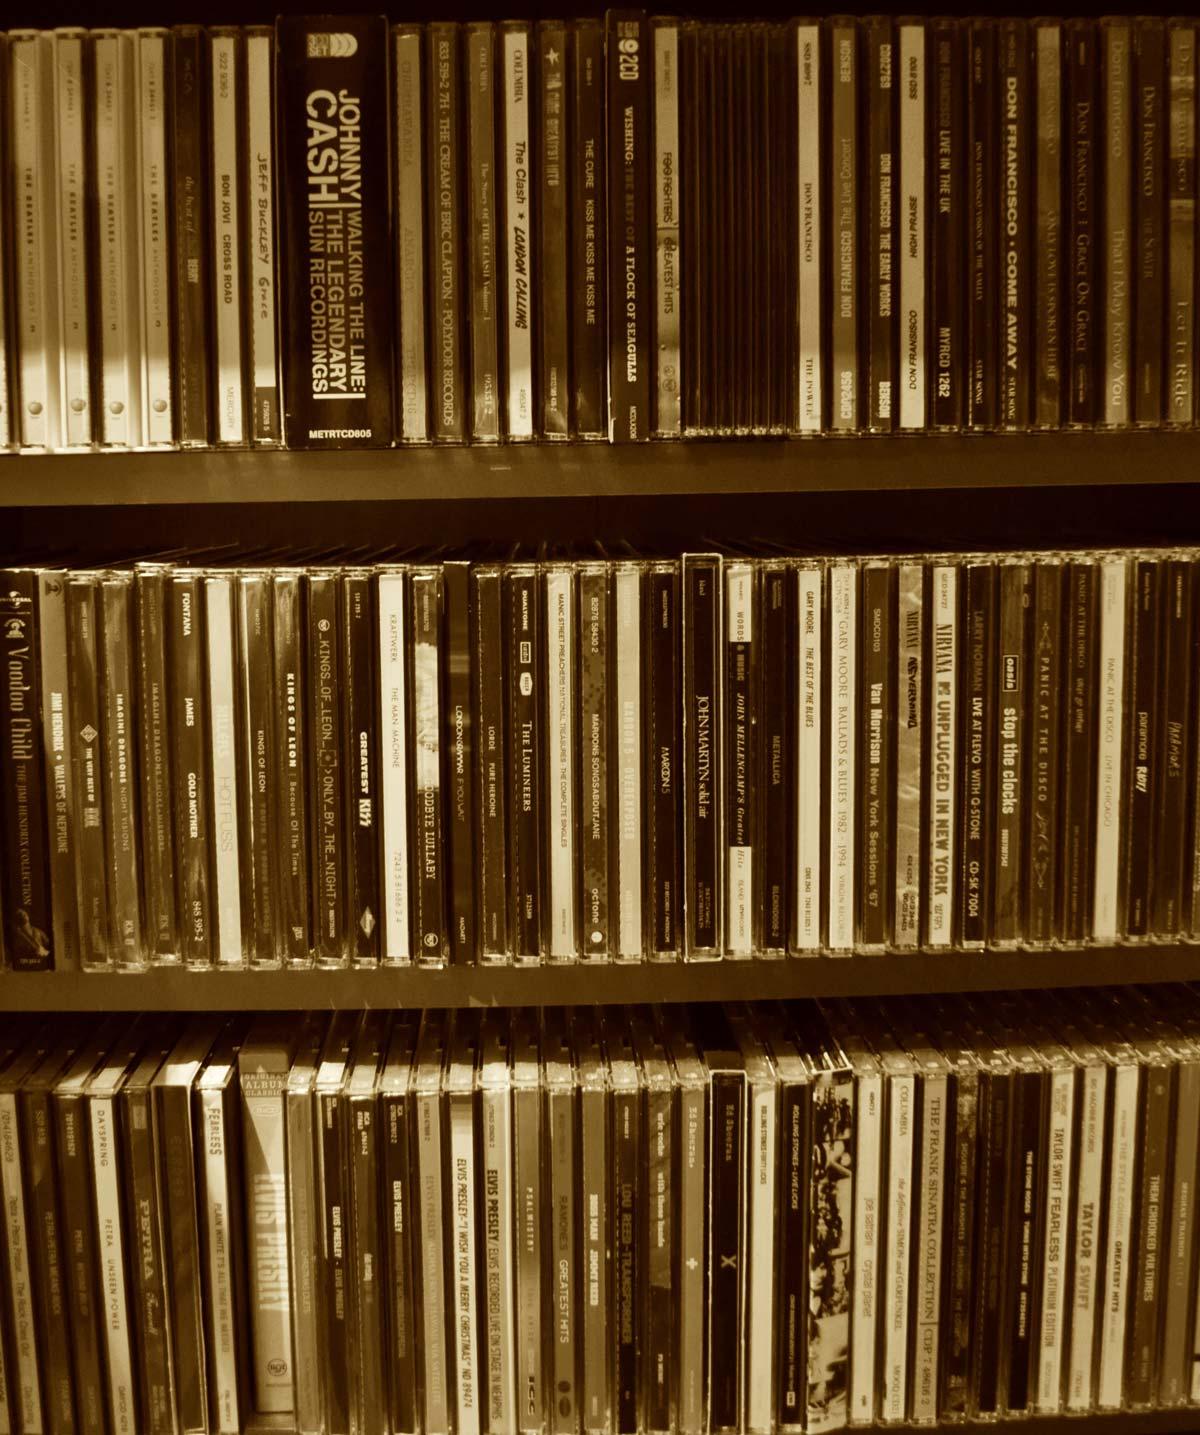 Potting Shed CDs